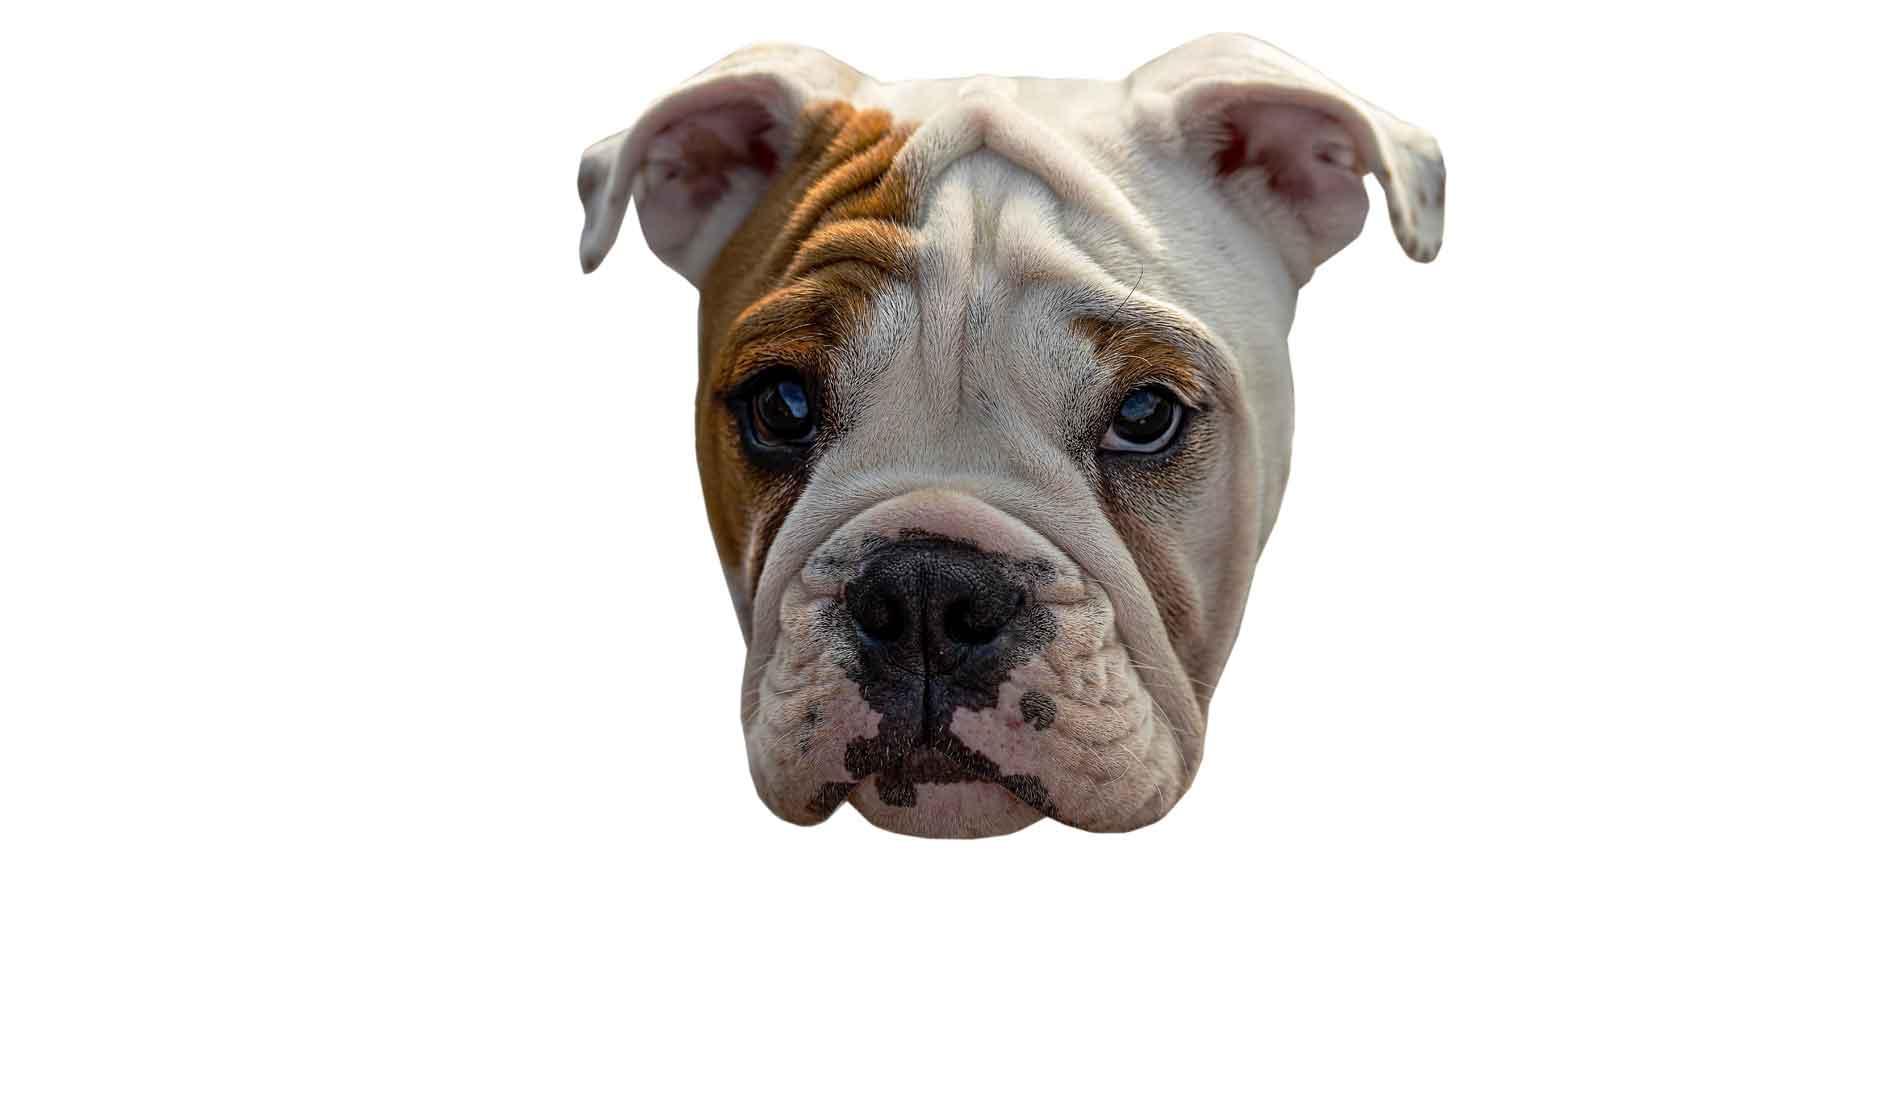 Wenn eine Bulldogge sich an dir aufgeilt